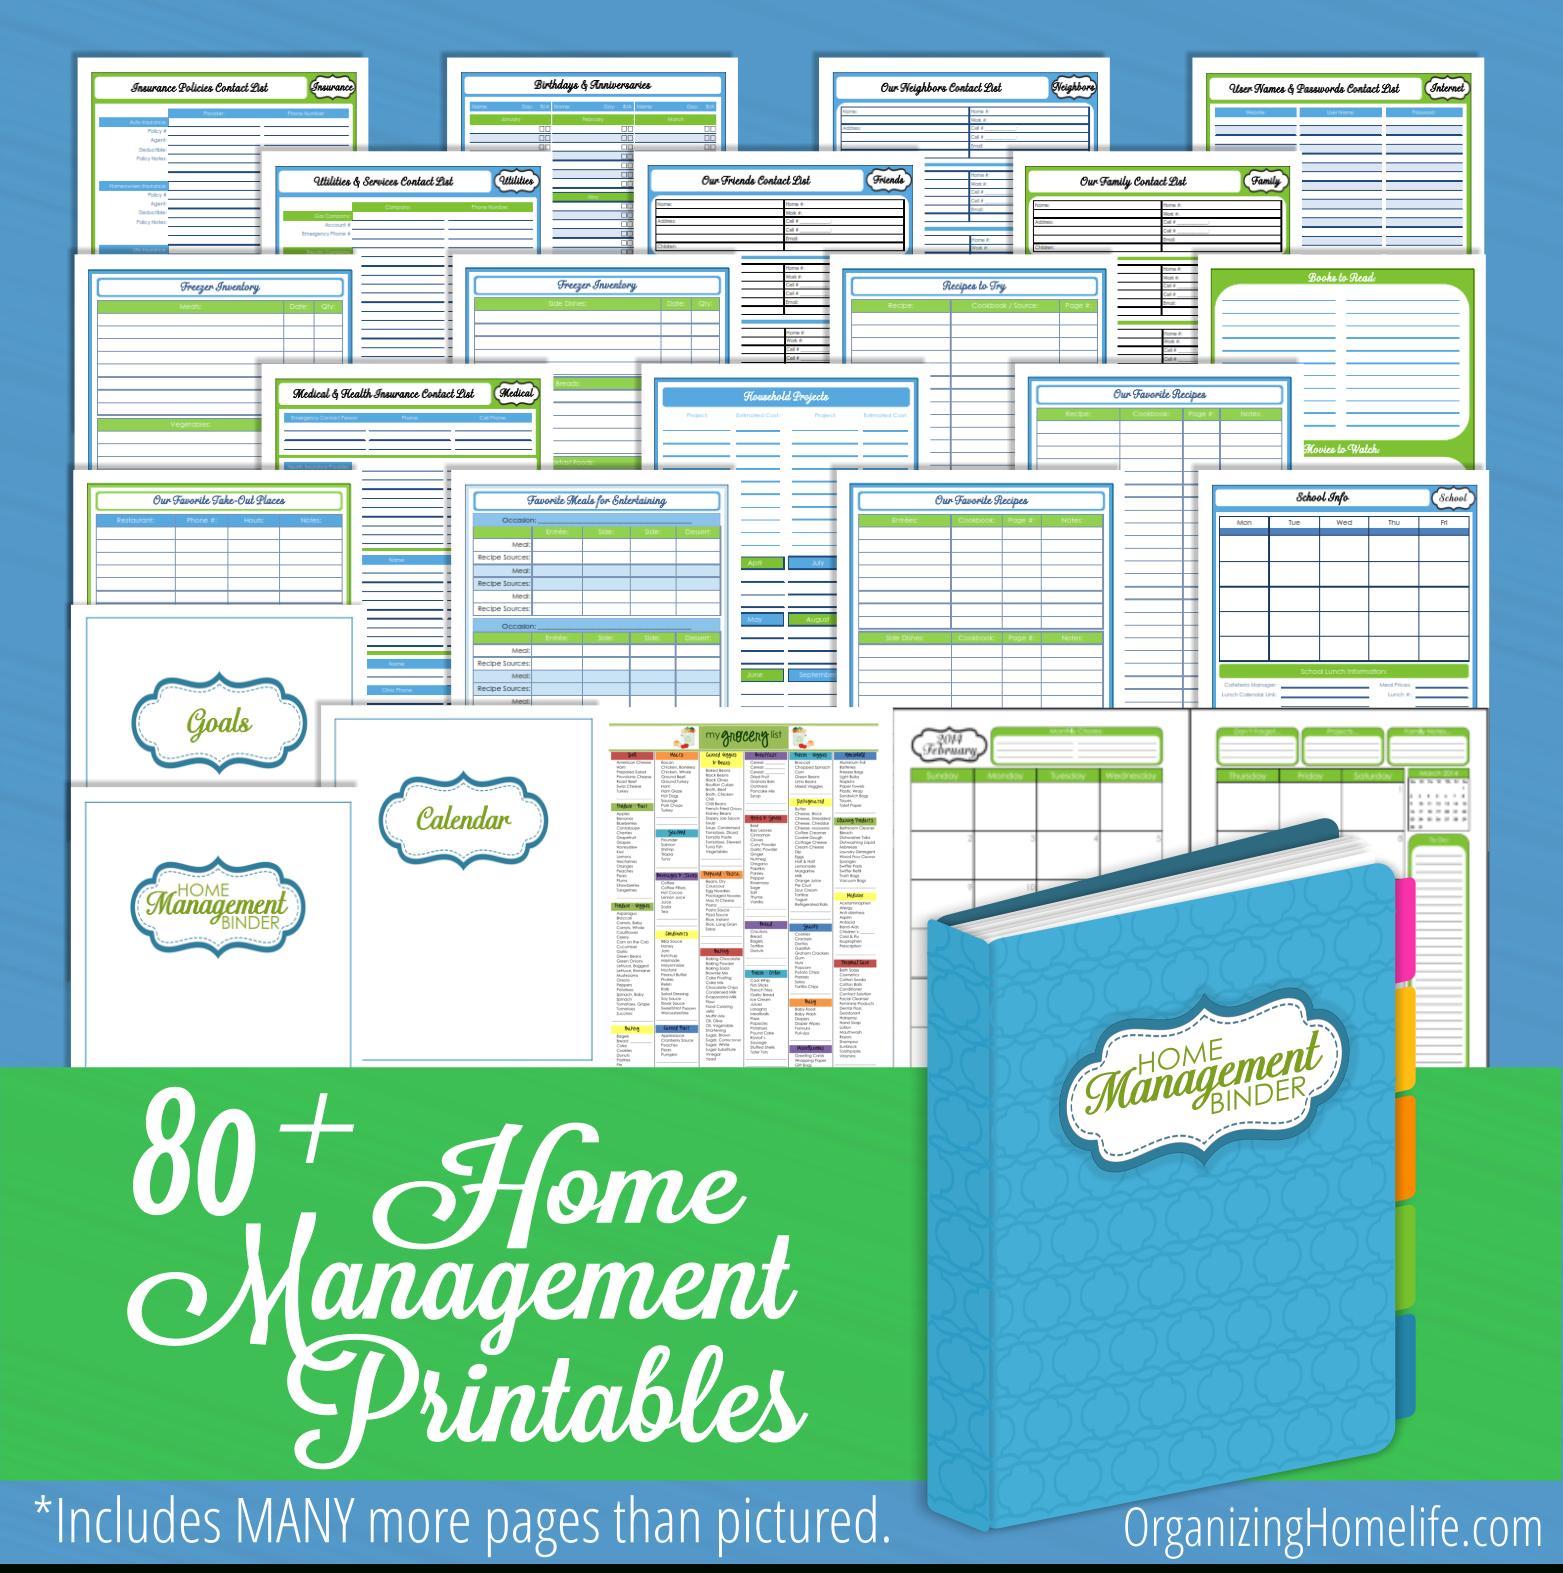 Organizing Homelife Home Management Binder Printables - Clean Mama - Free Printable Household Binder